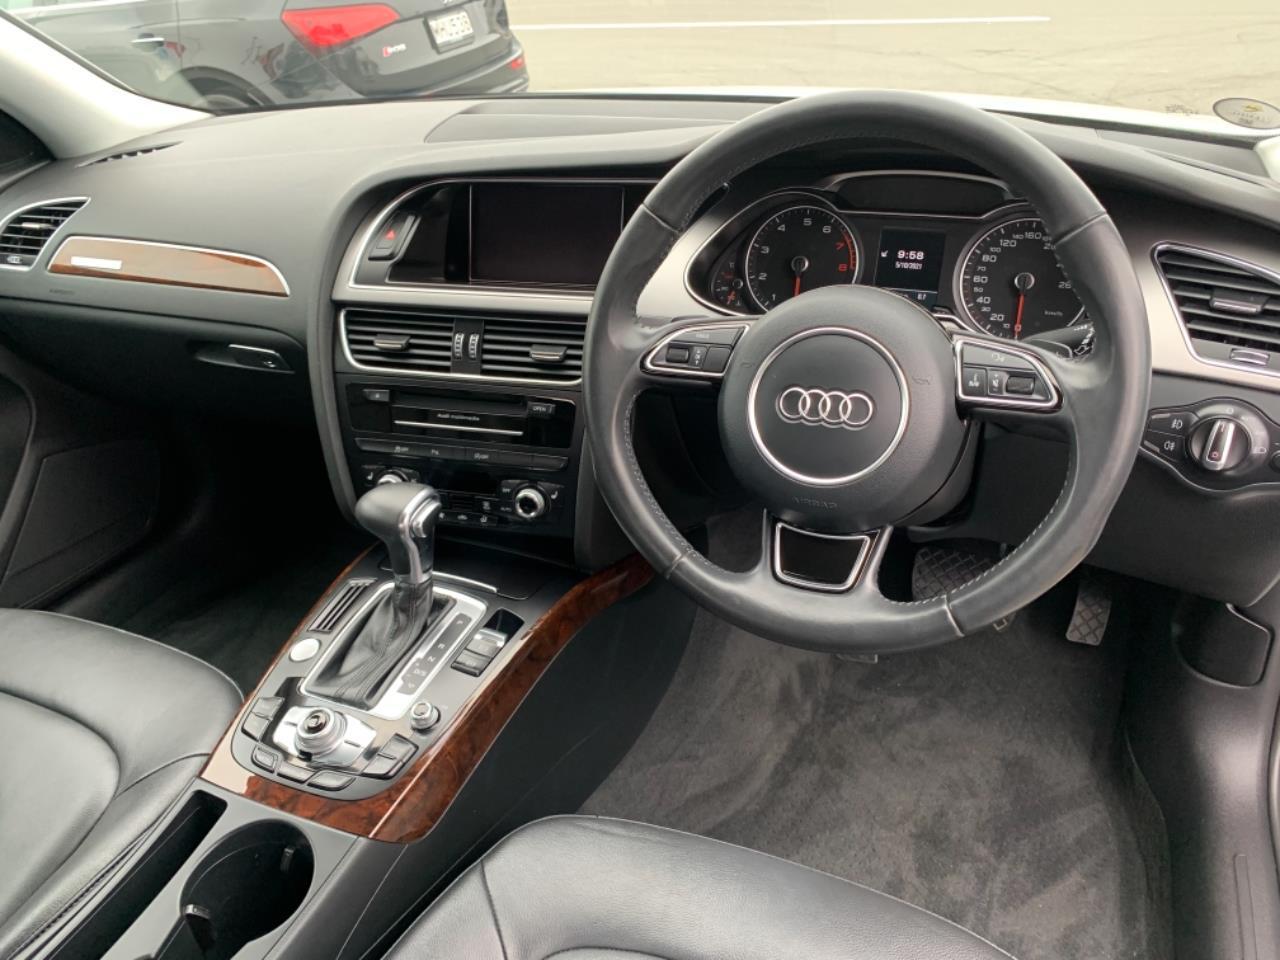 image-7, 2012 Audi A4 Allroad Quattro at Christchurch